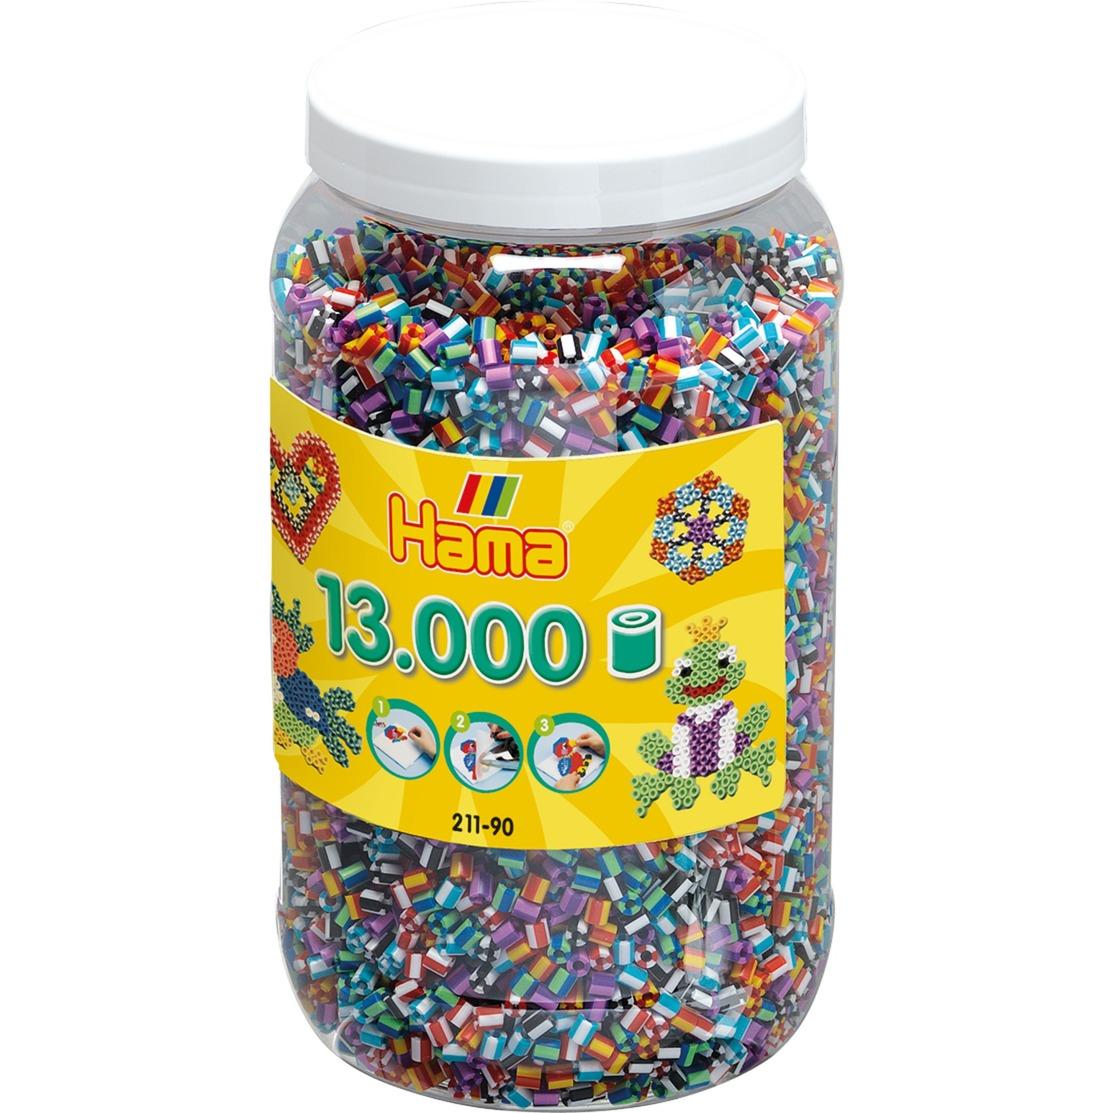 211-90 abalorio Tube bead Multicolor 13000 pieza(s), Manualidades